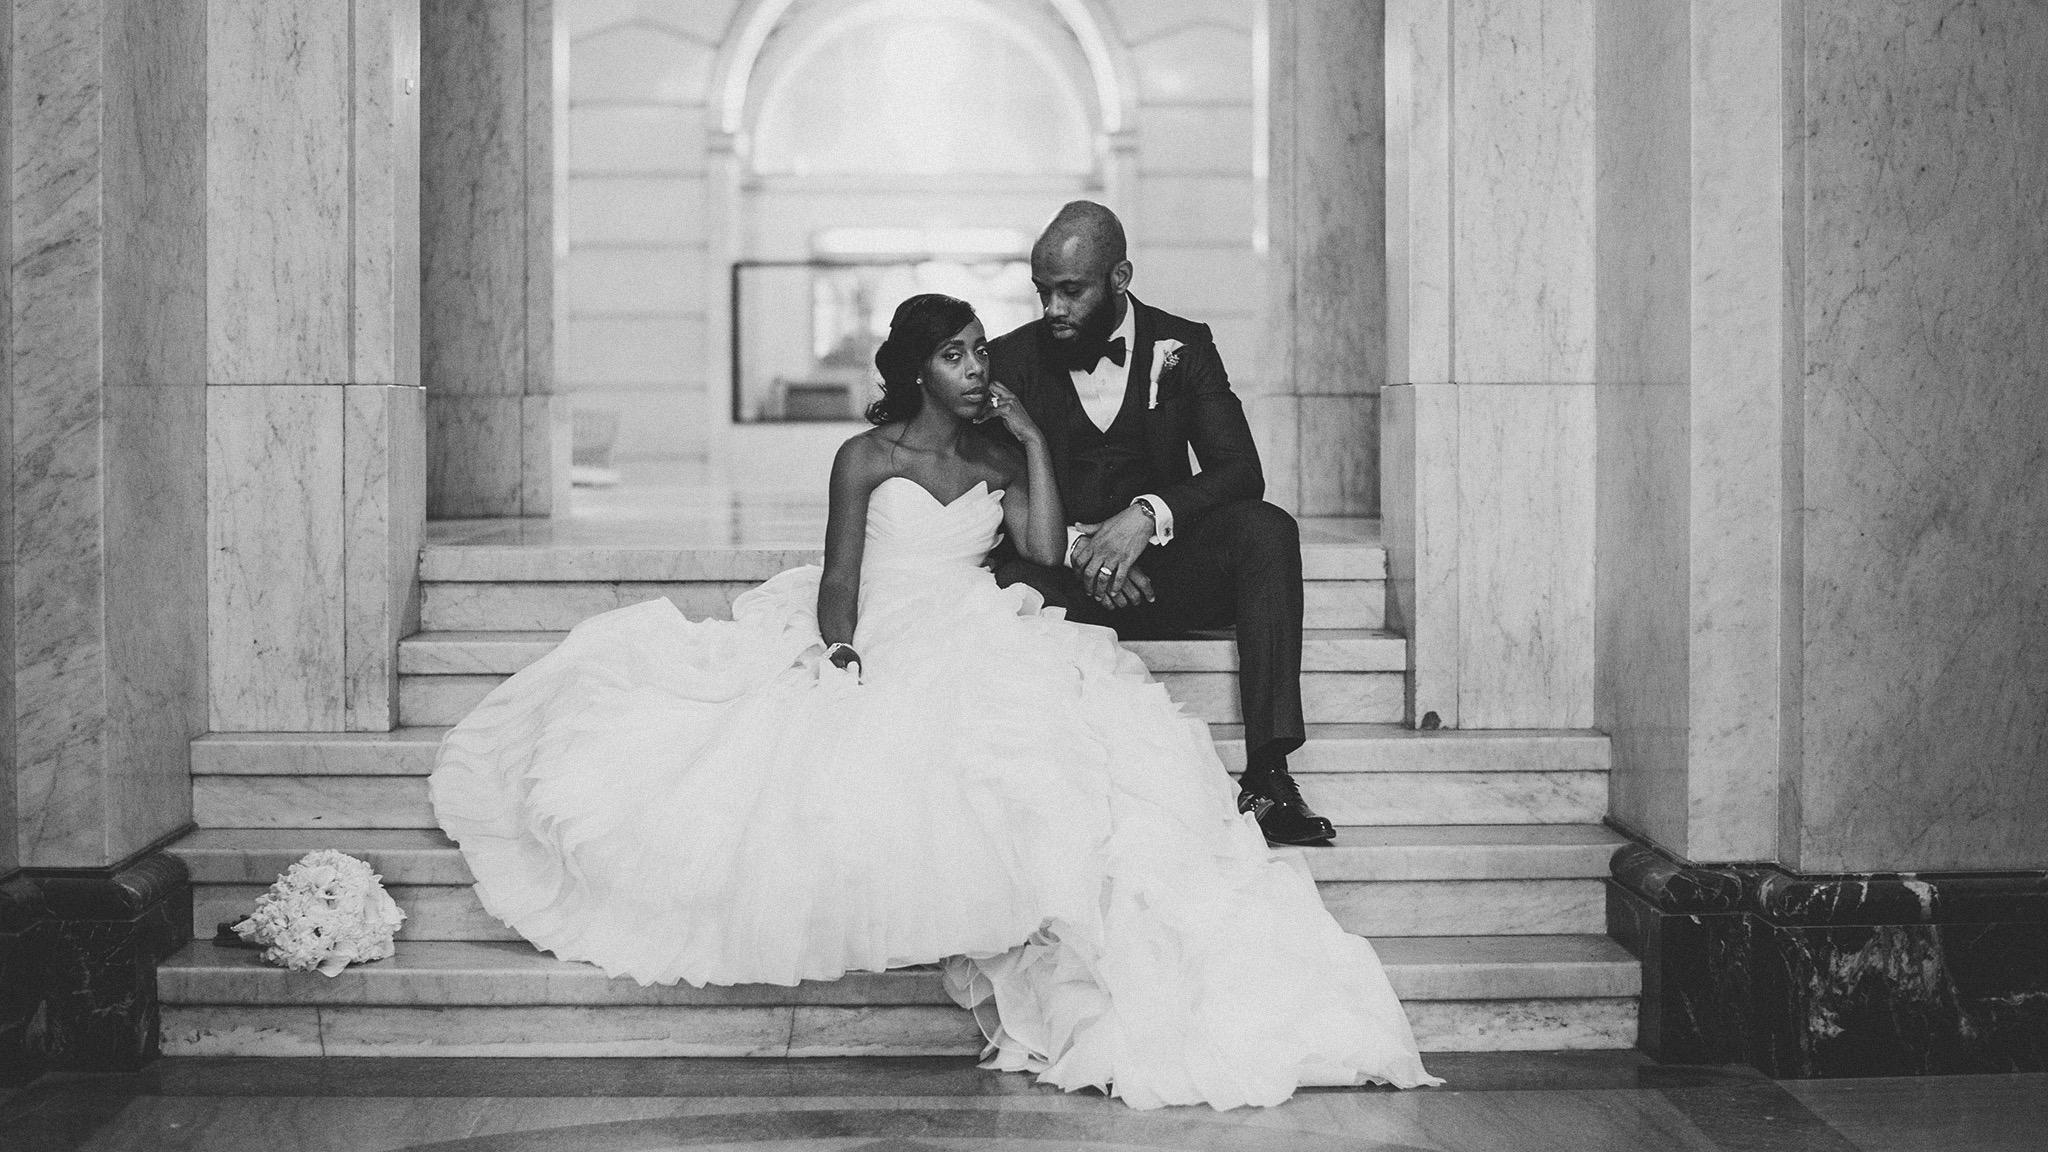 63-Luzerne-courthouse-weddings.jpg